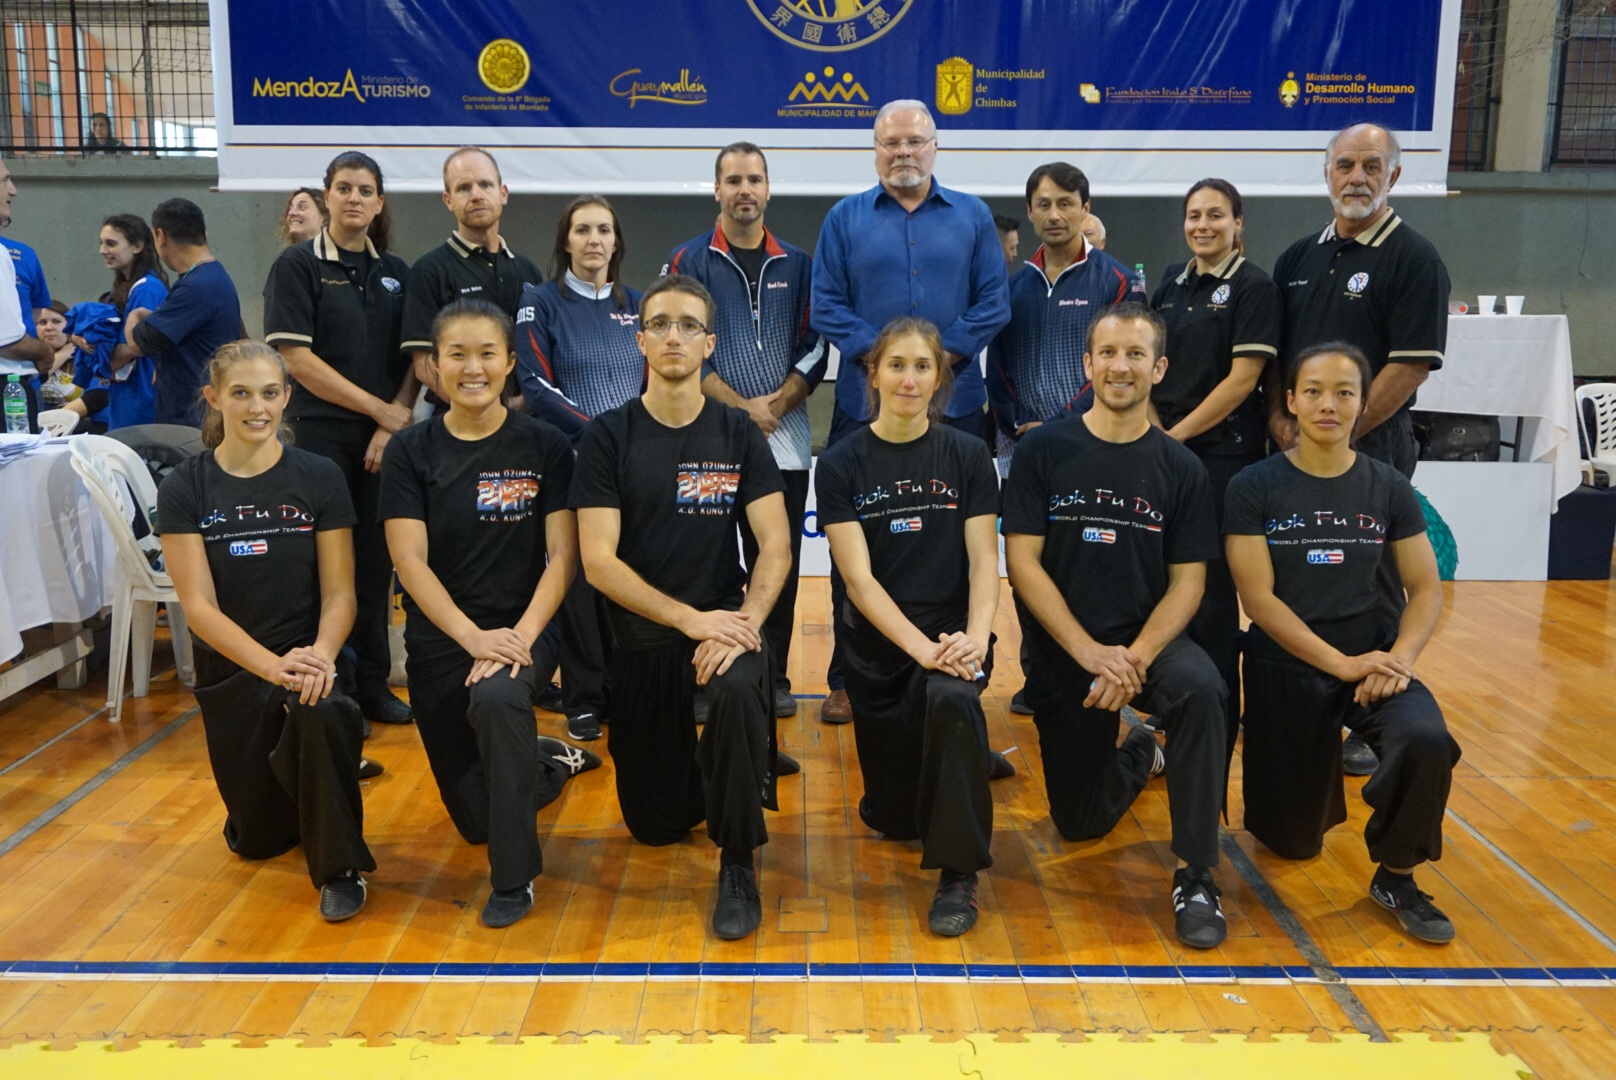 Grandmaster Richard Lee, Master John Buckley,, Master John Ozuna and Master Morgan Newman with the Bok Fu Do Black Belts division (2015)